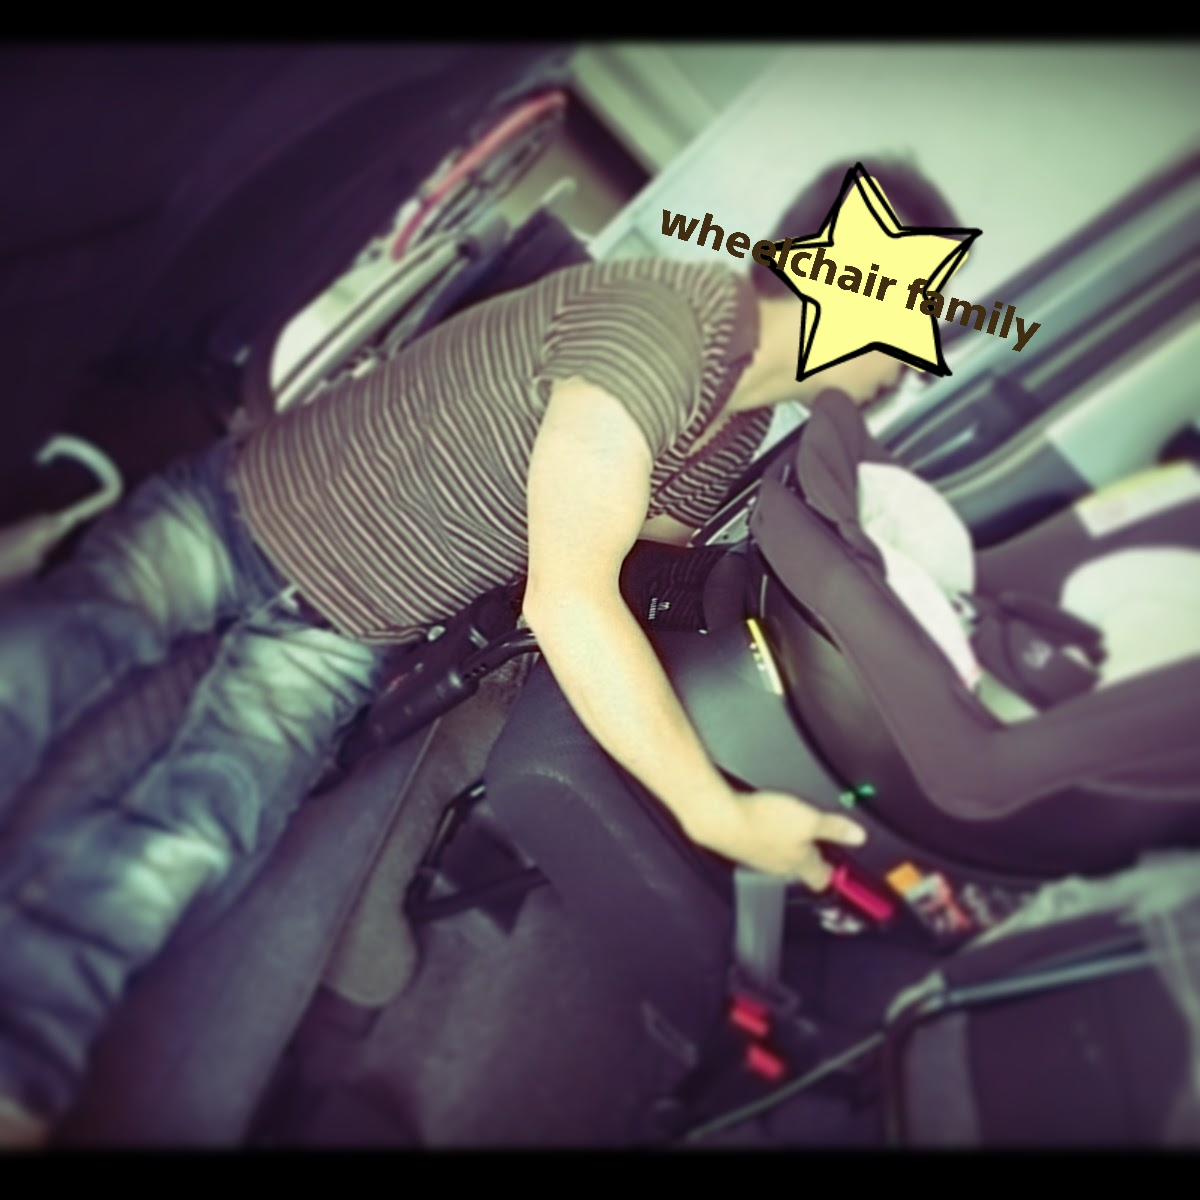 f:id:WheelchairFamily:20200611150742j:plain